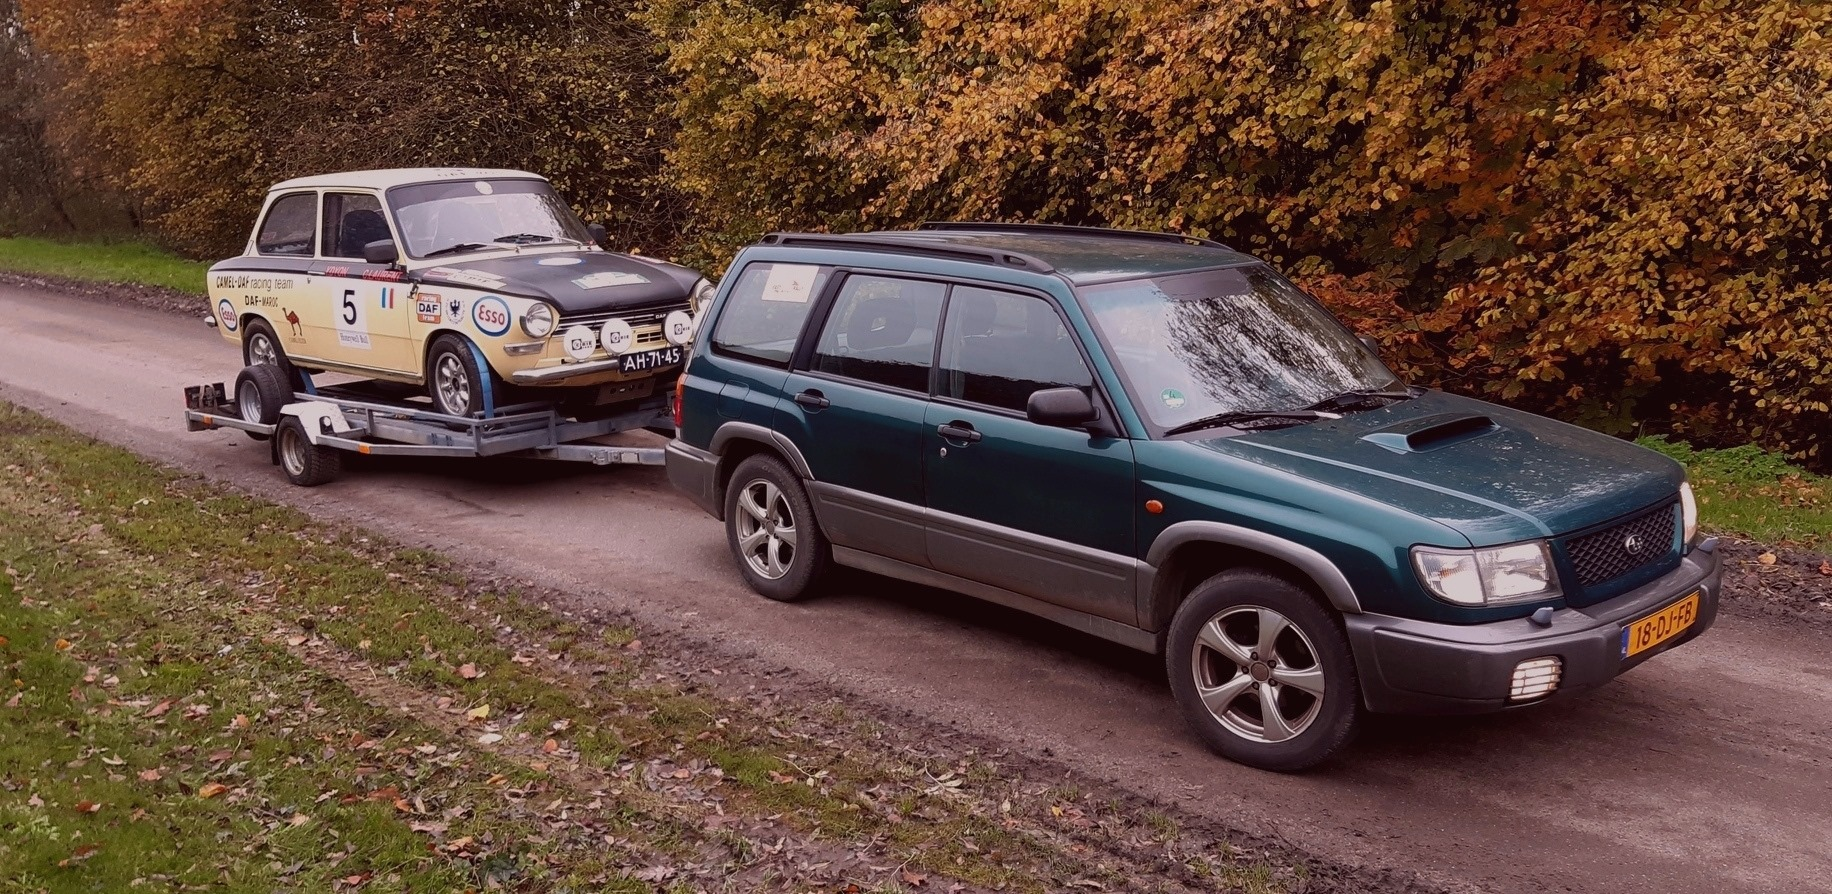 Rinus-Blankenstein-2019-Kempen-rally-reg-60-km--pu-(4)